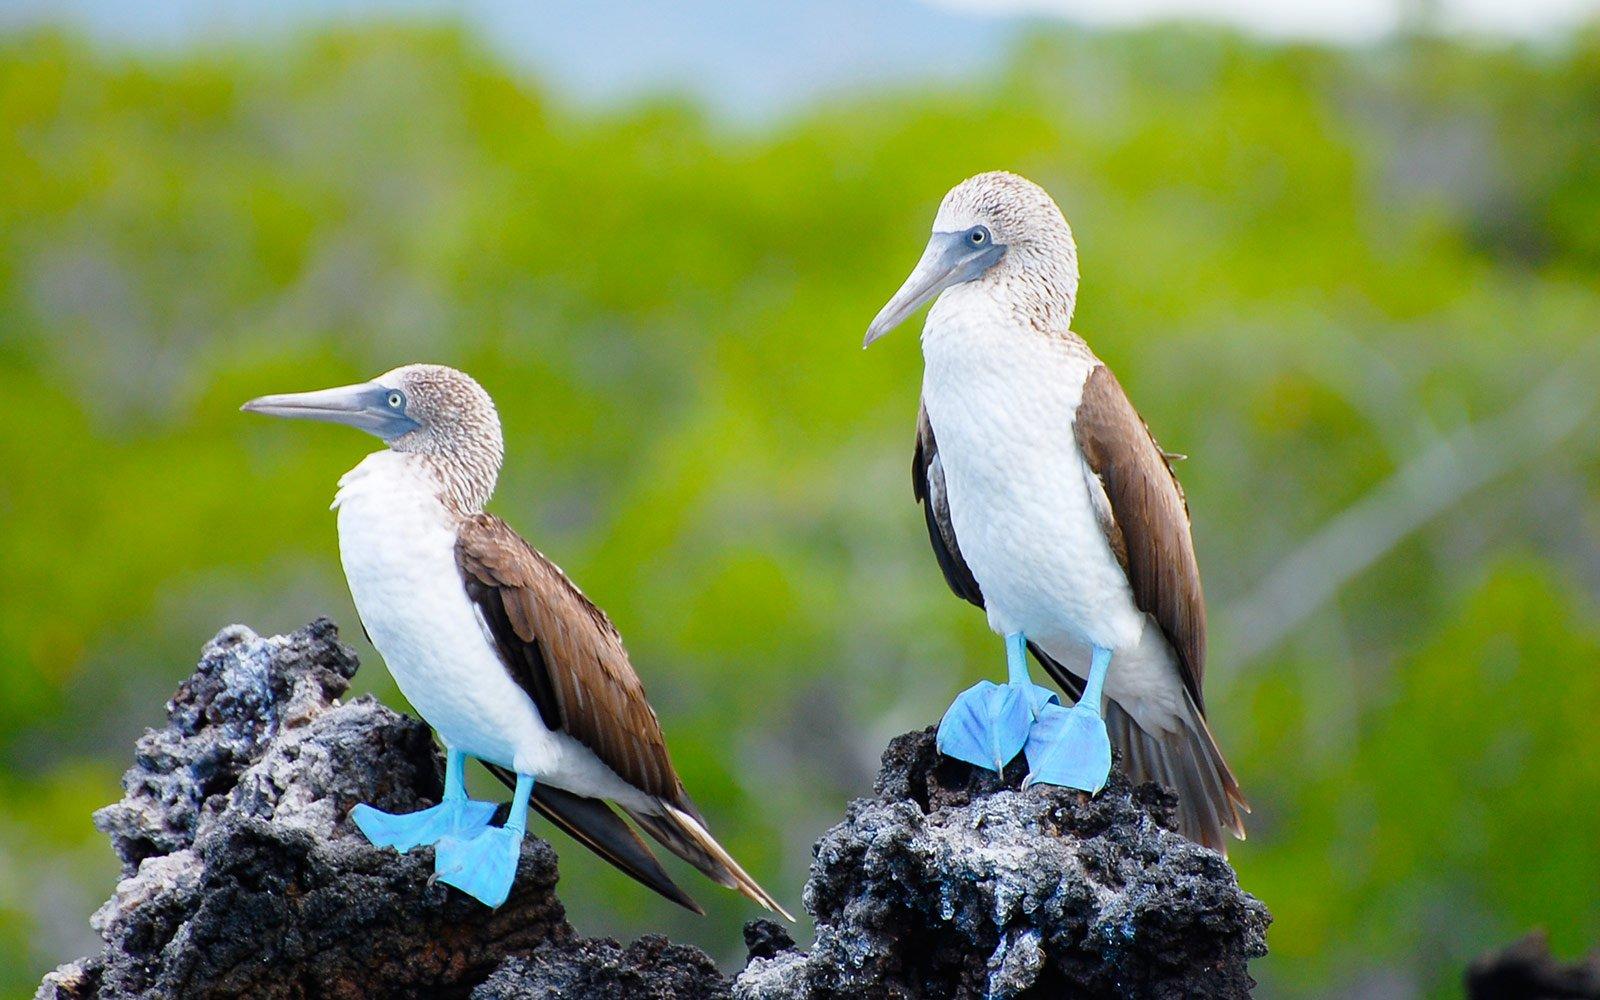 blue-footed-booby-galapagos-ecuador-GALAPA1104_2048x2048.jpg